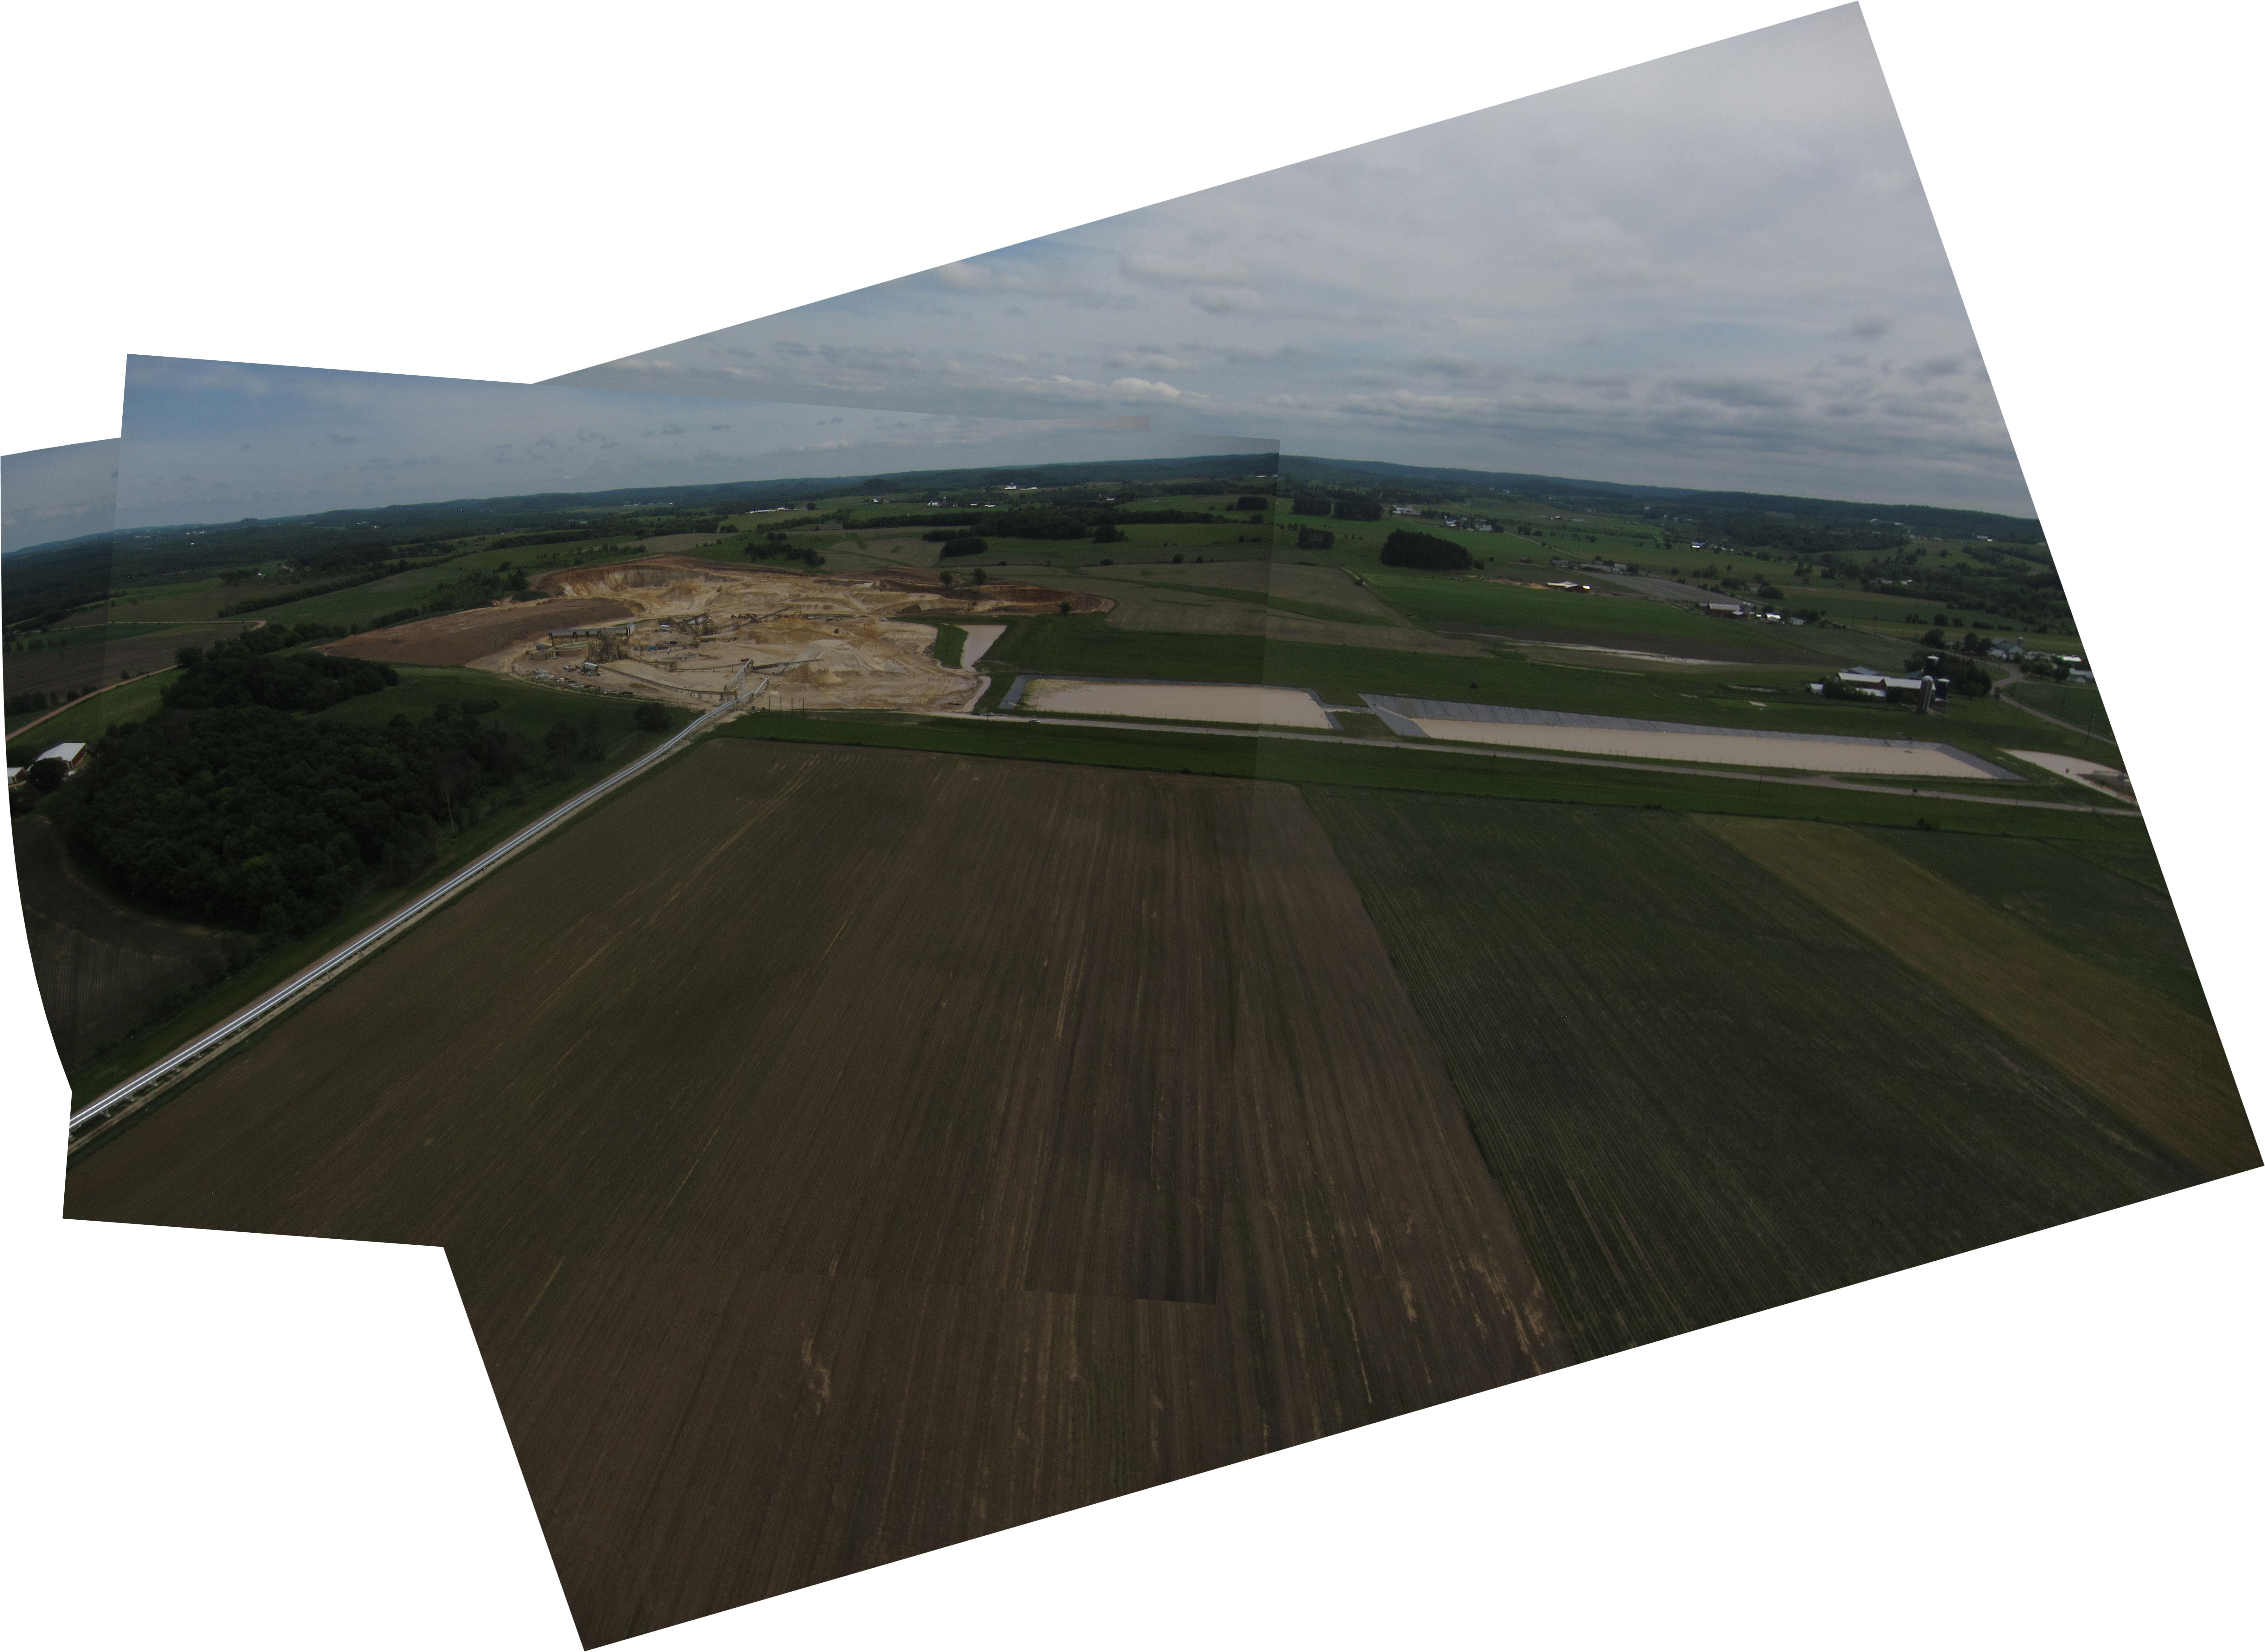 Augusta Frac Sand Mine